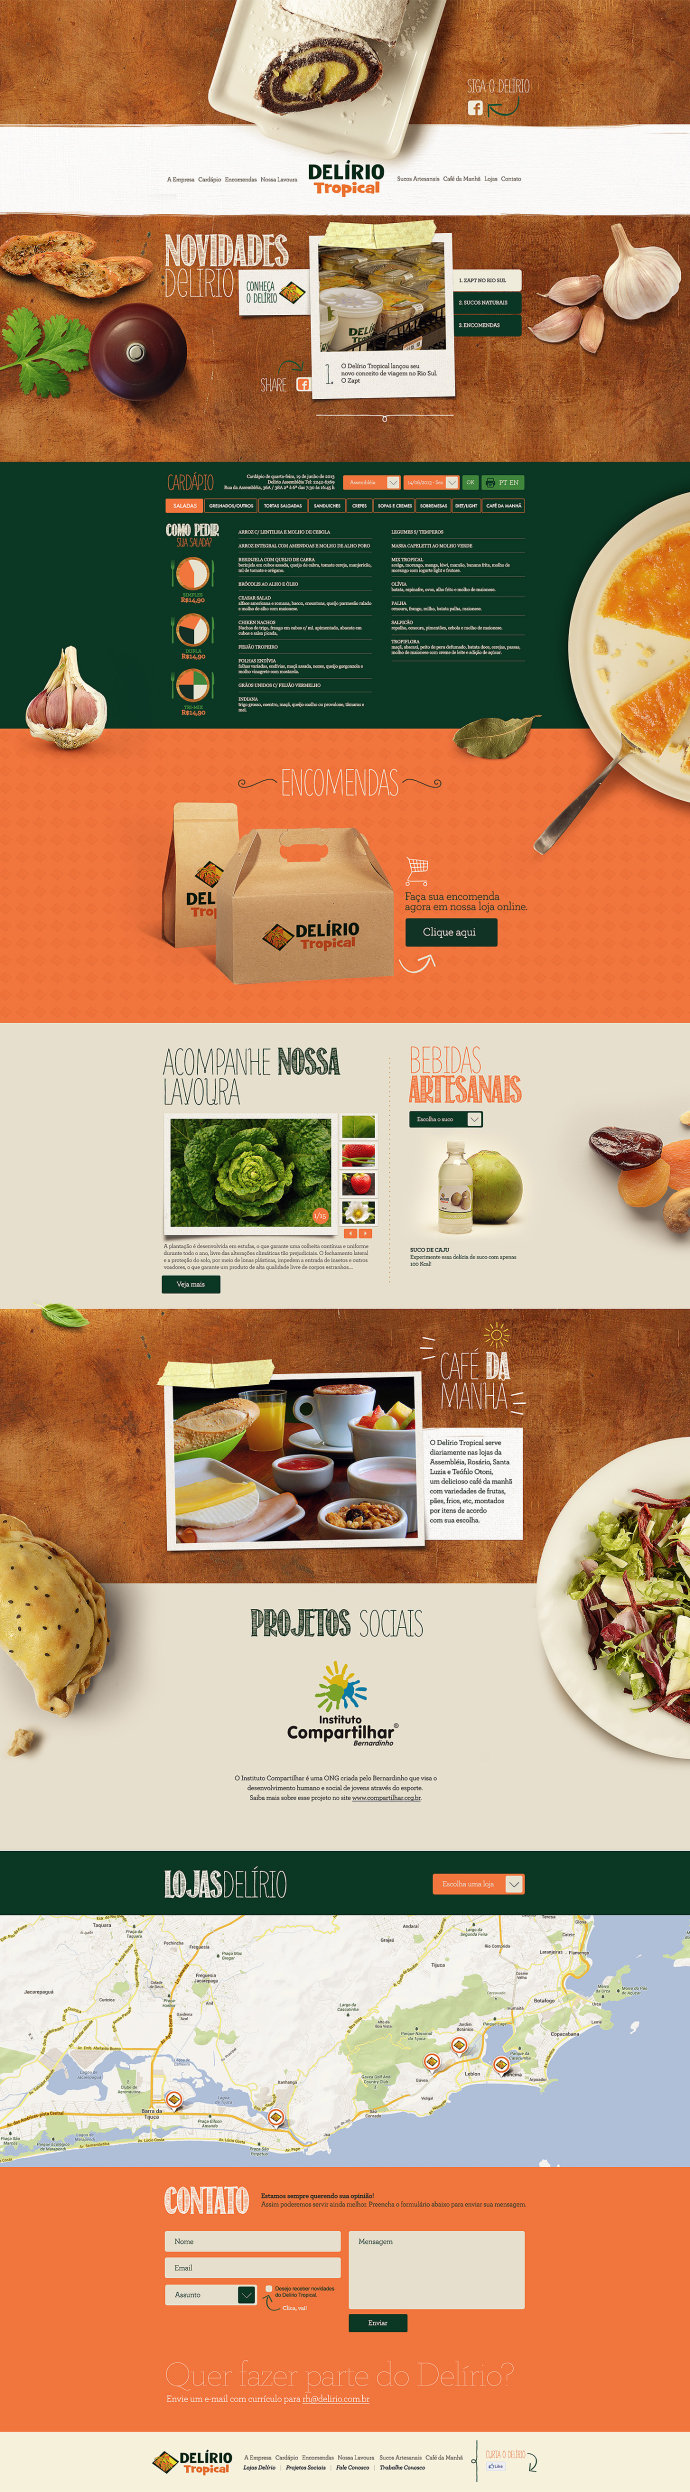 Delírio食品包装欣赏